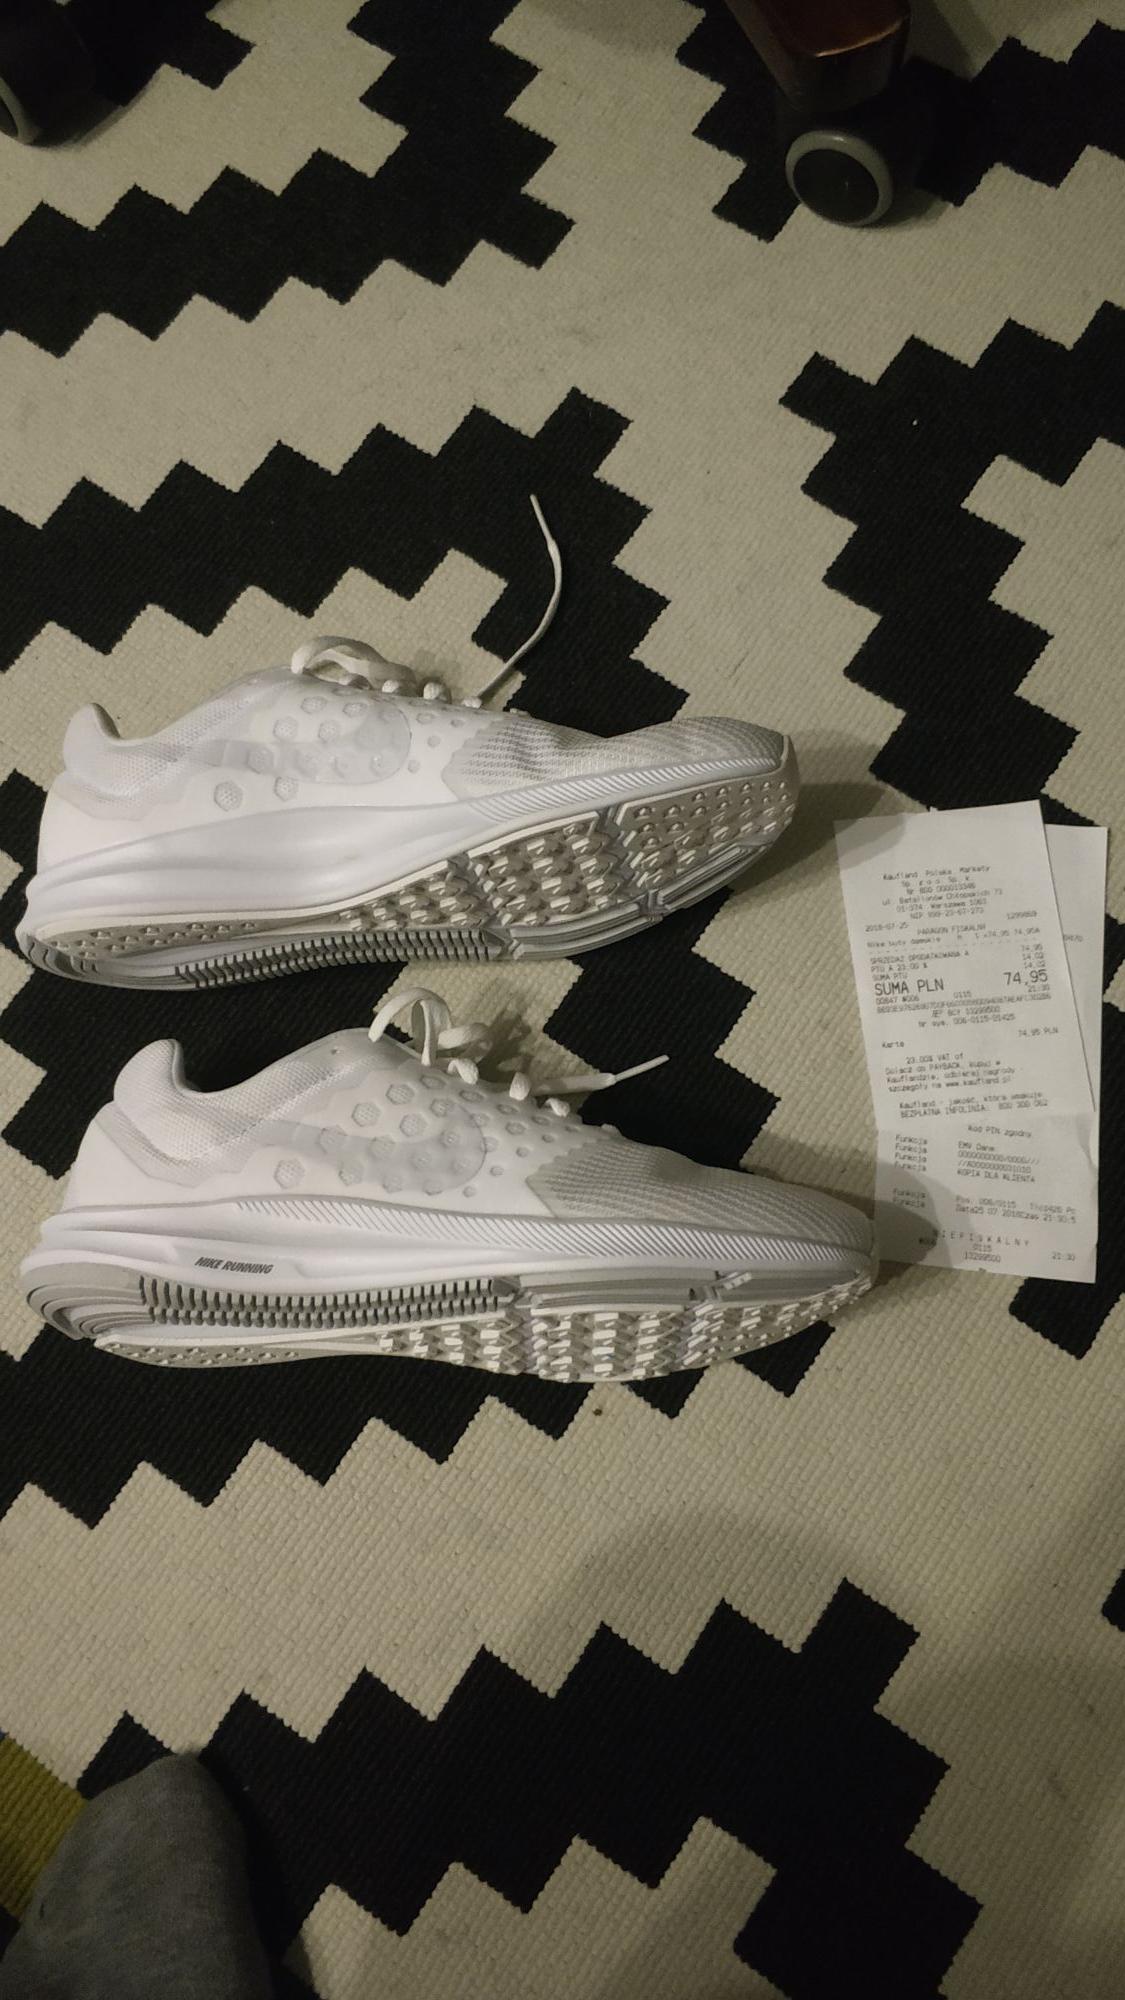 Buty Nike do biegania Kaufland